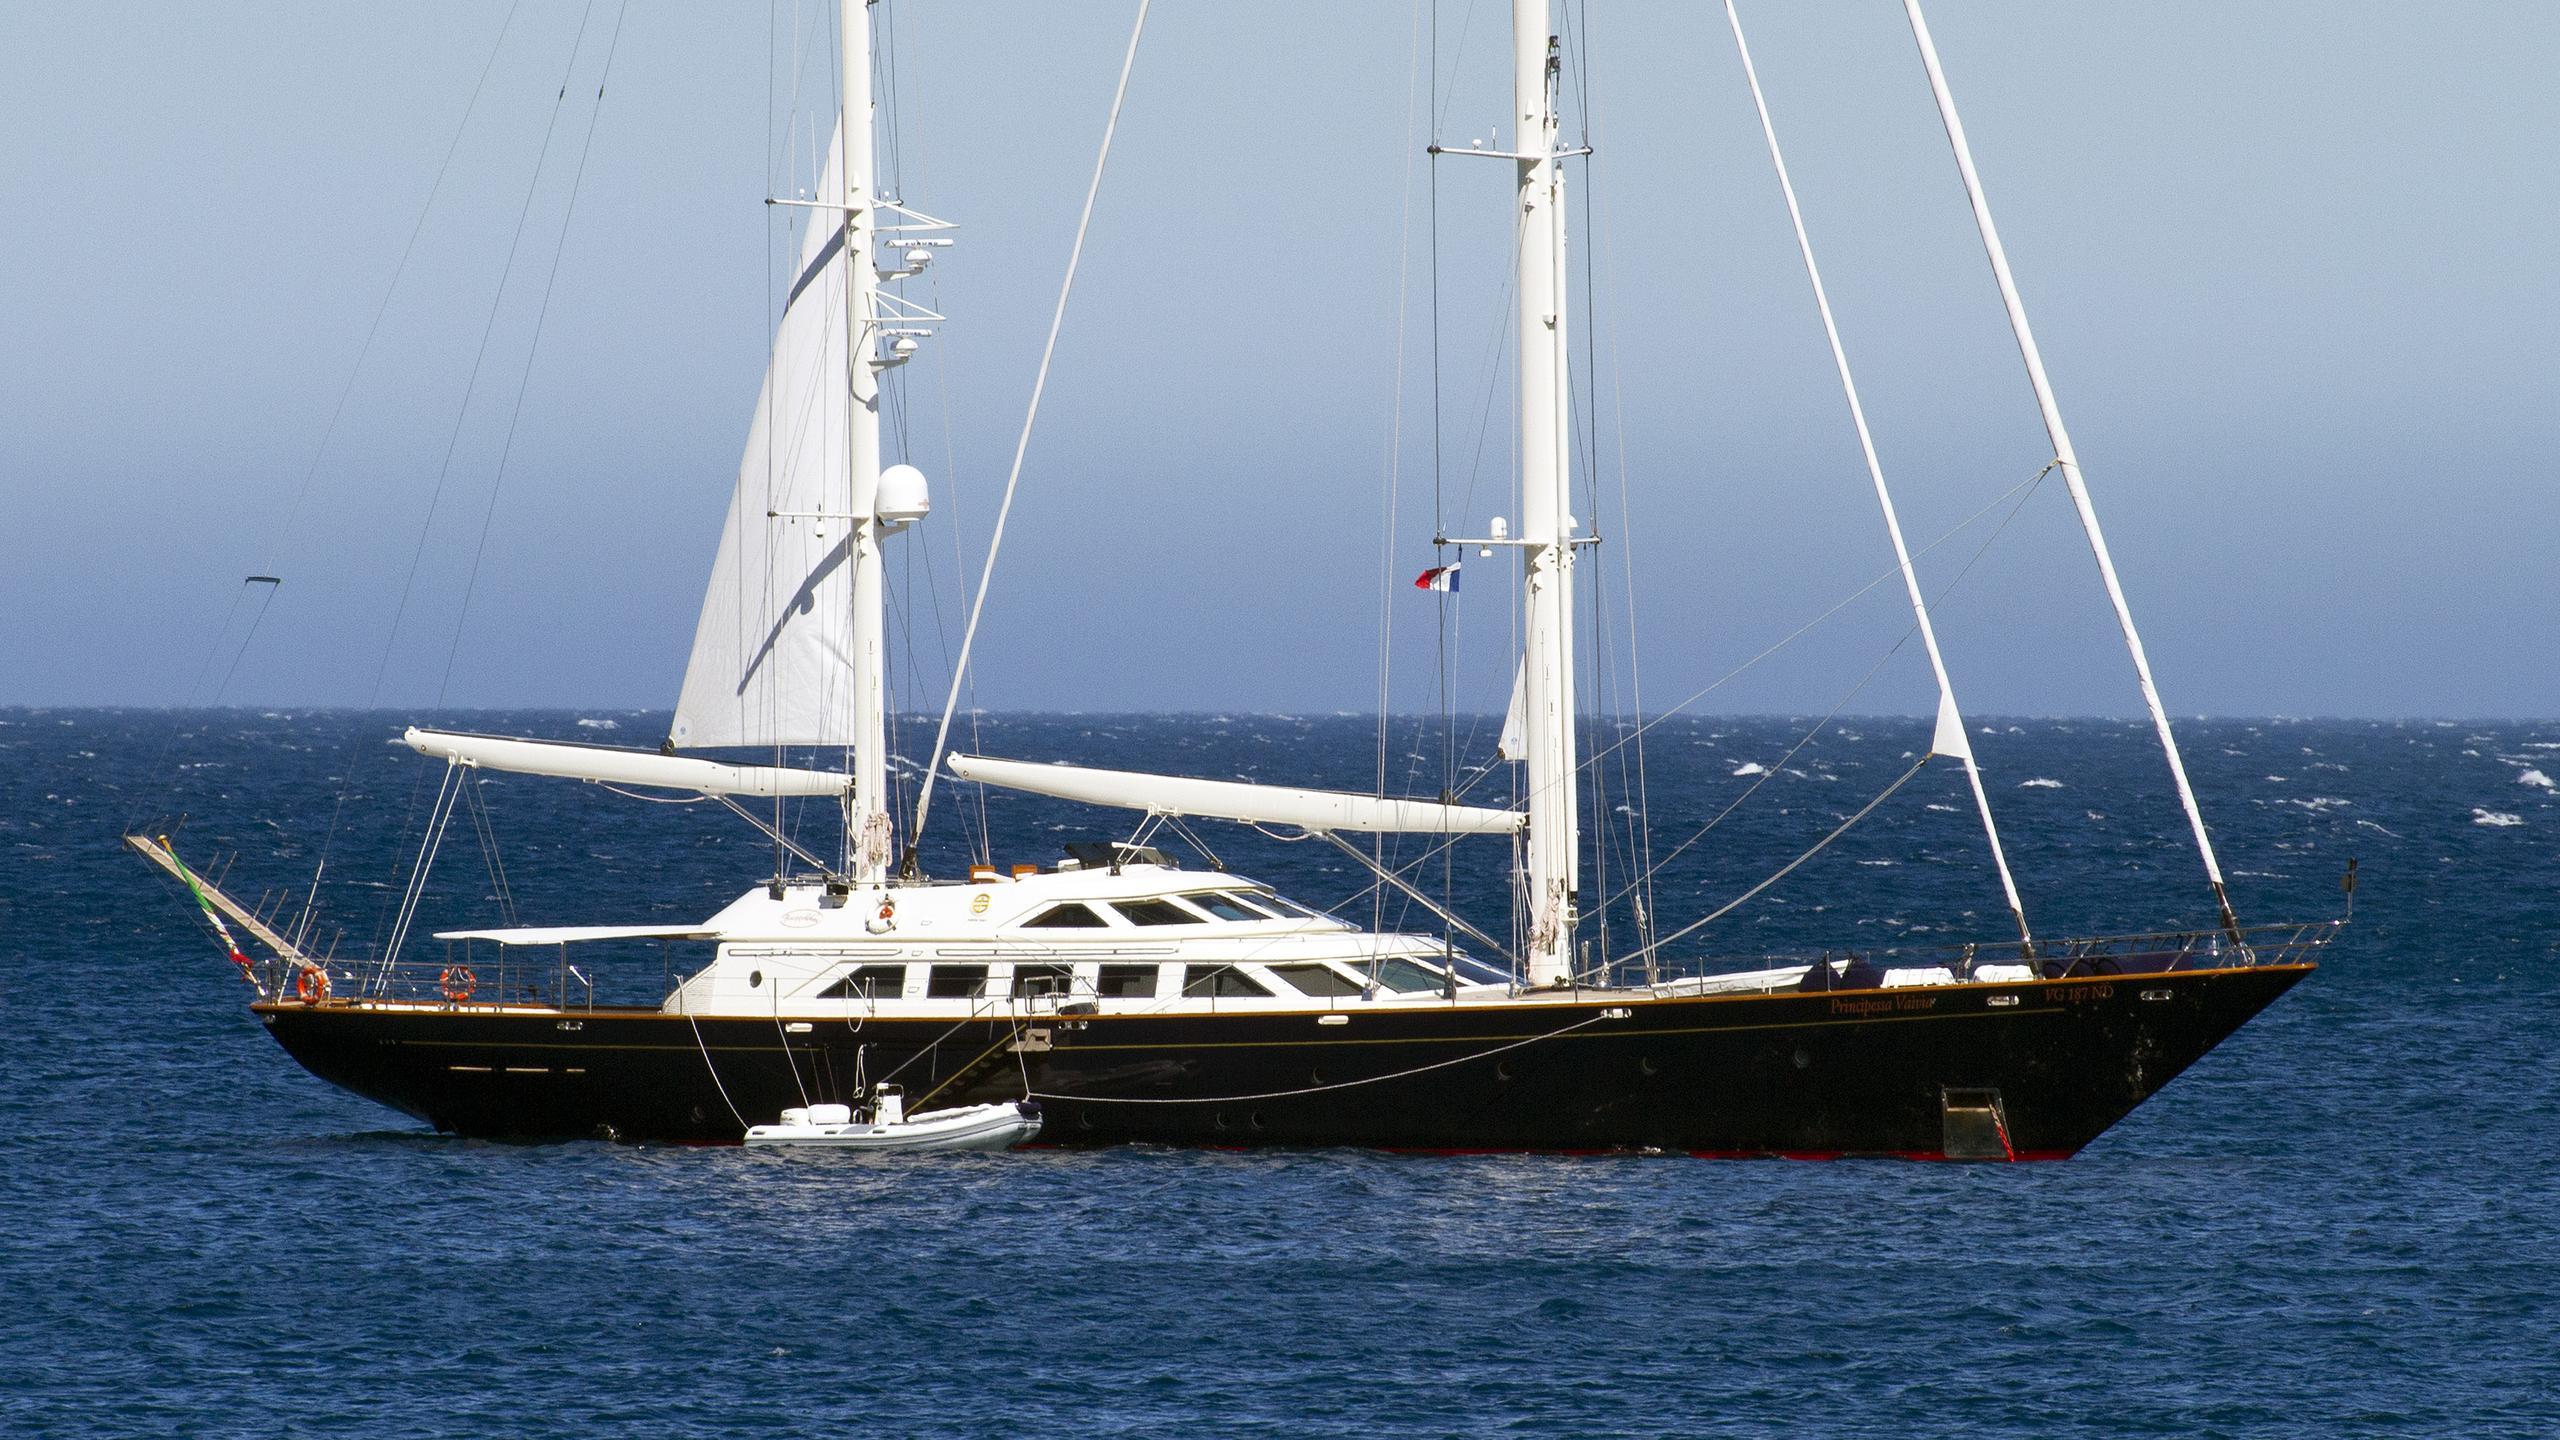 principessa-vaivia-sailing-yacht-perini-navi-1991-40m-profile